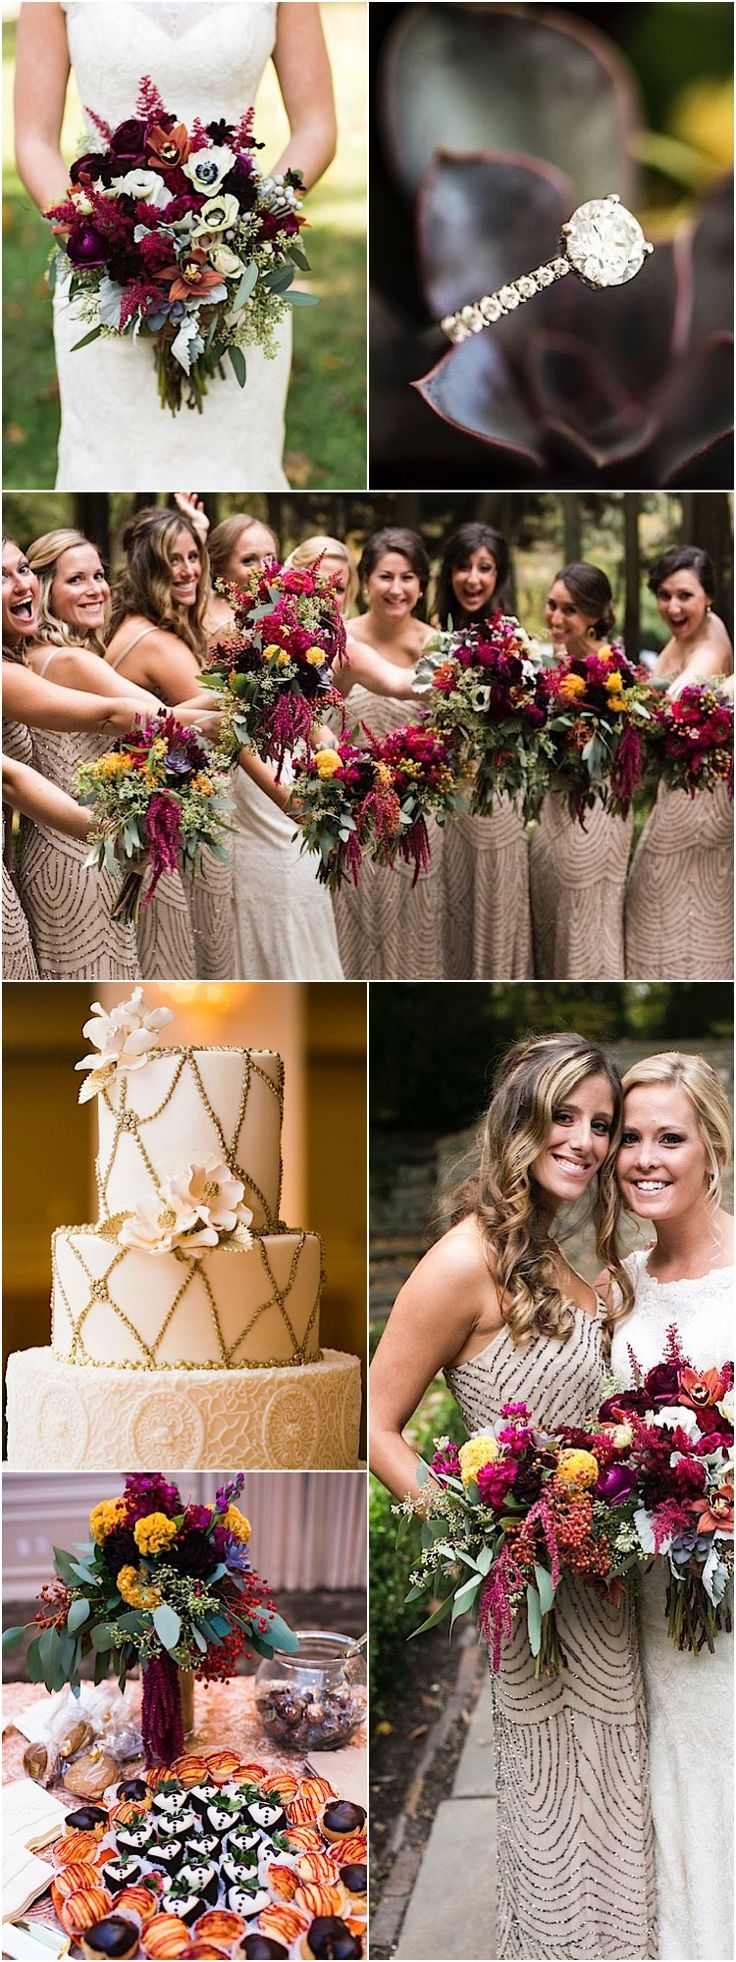 Yellow wedding decorations ideas november 2018  best Dream Wedding u Future images on Pinterest  Weddings